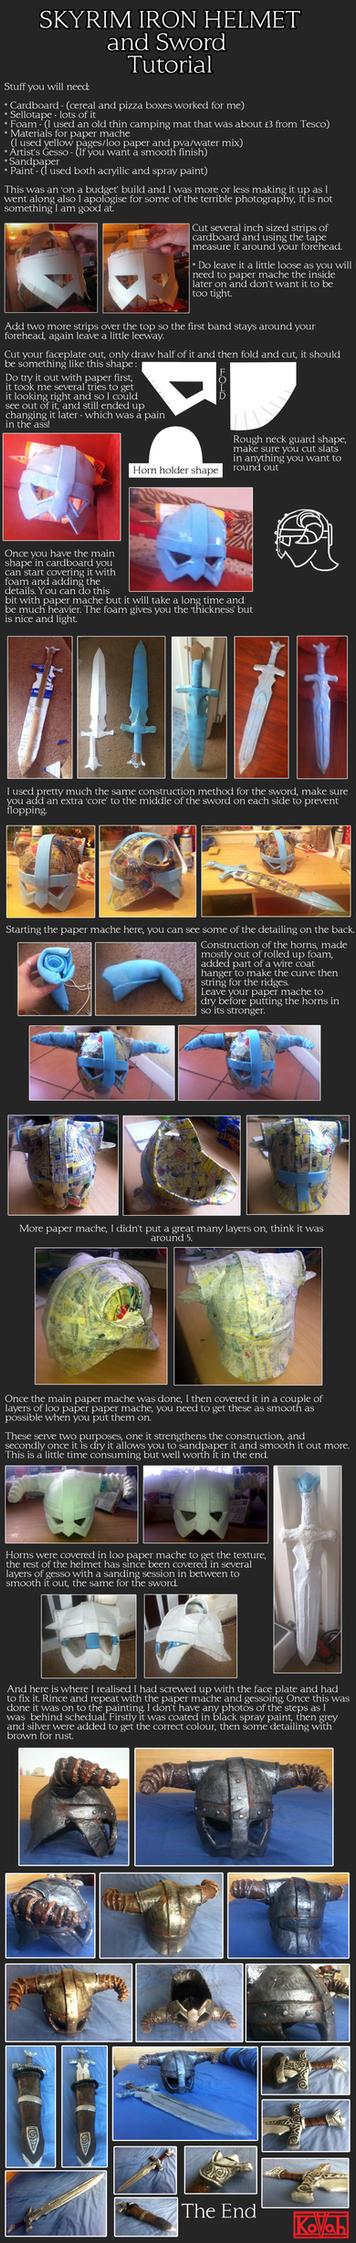 Iron Helmet and Sword cosplay tutorial by kovah